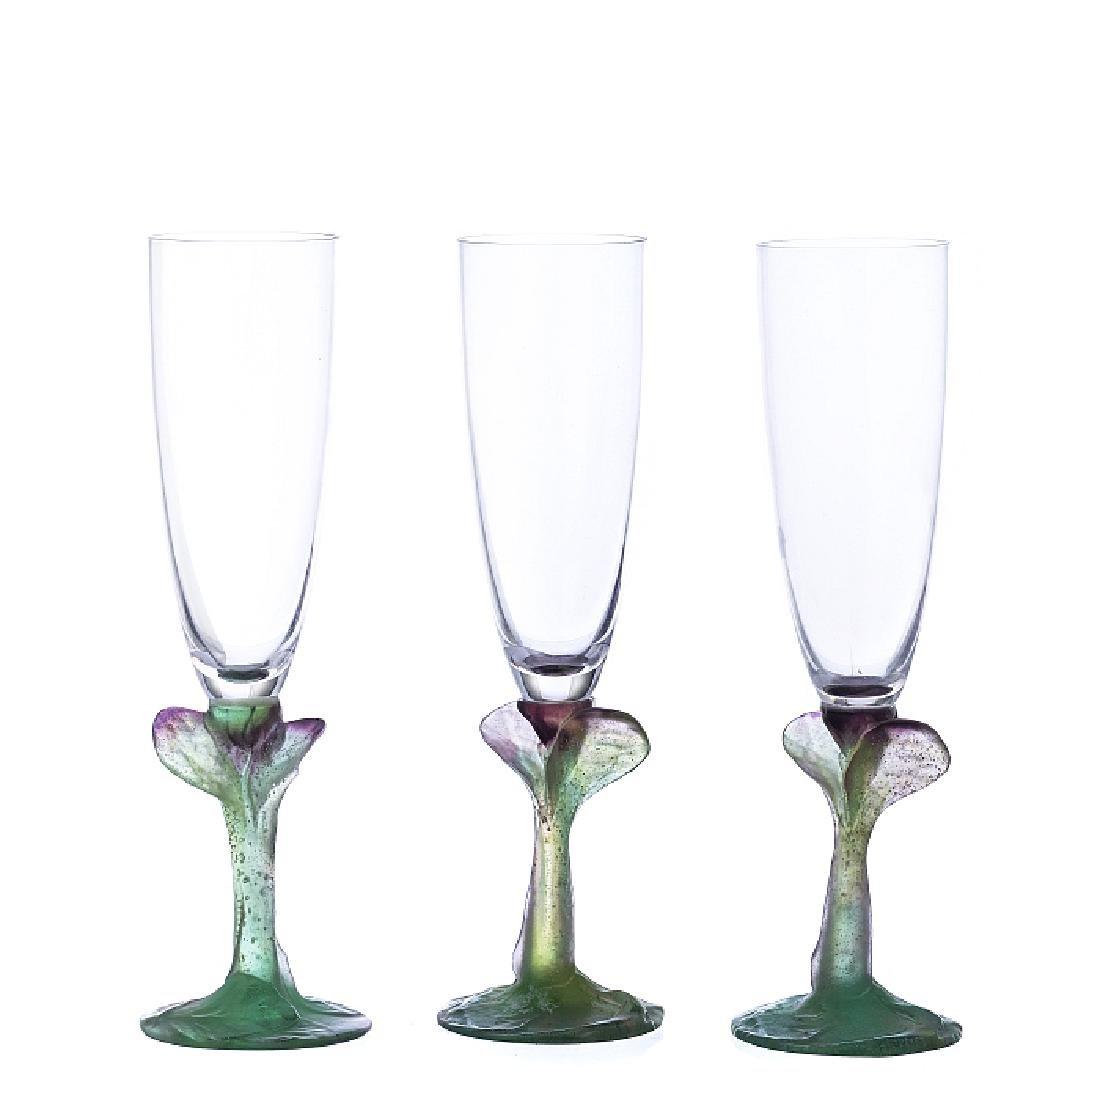 DAUM, FRANCE - Twelve flutes in crystal